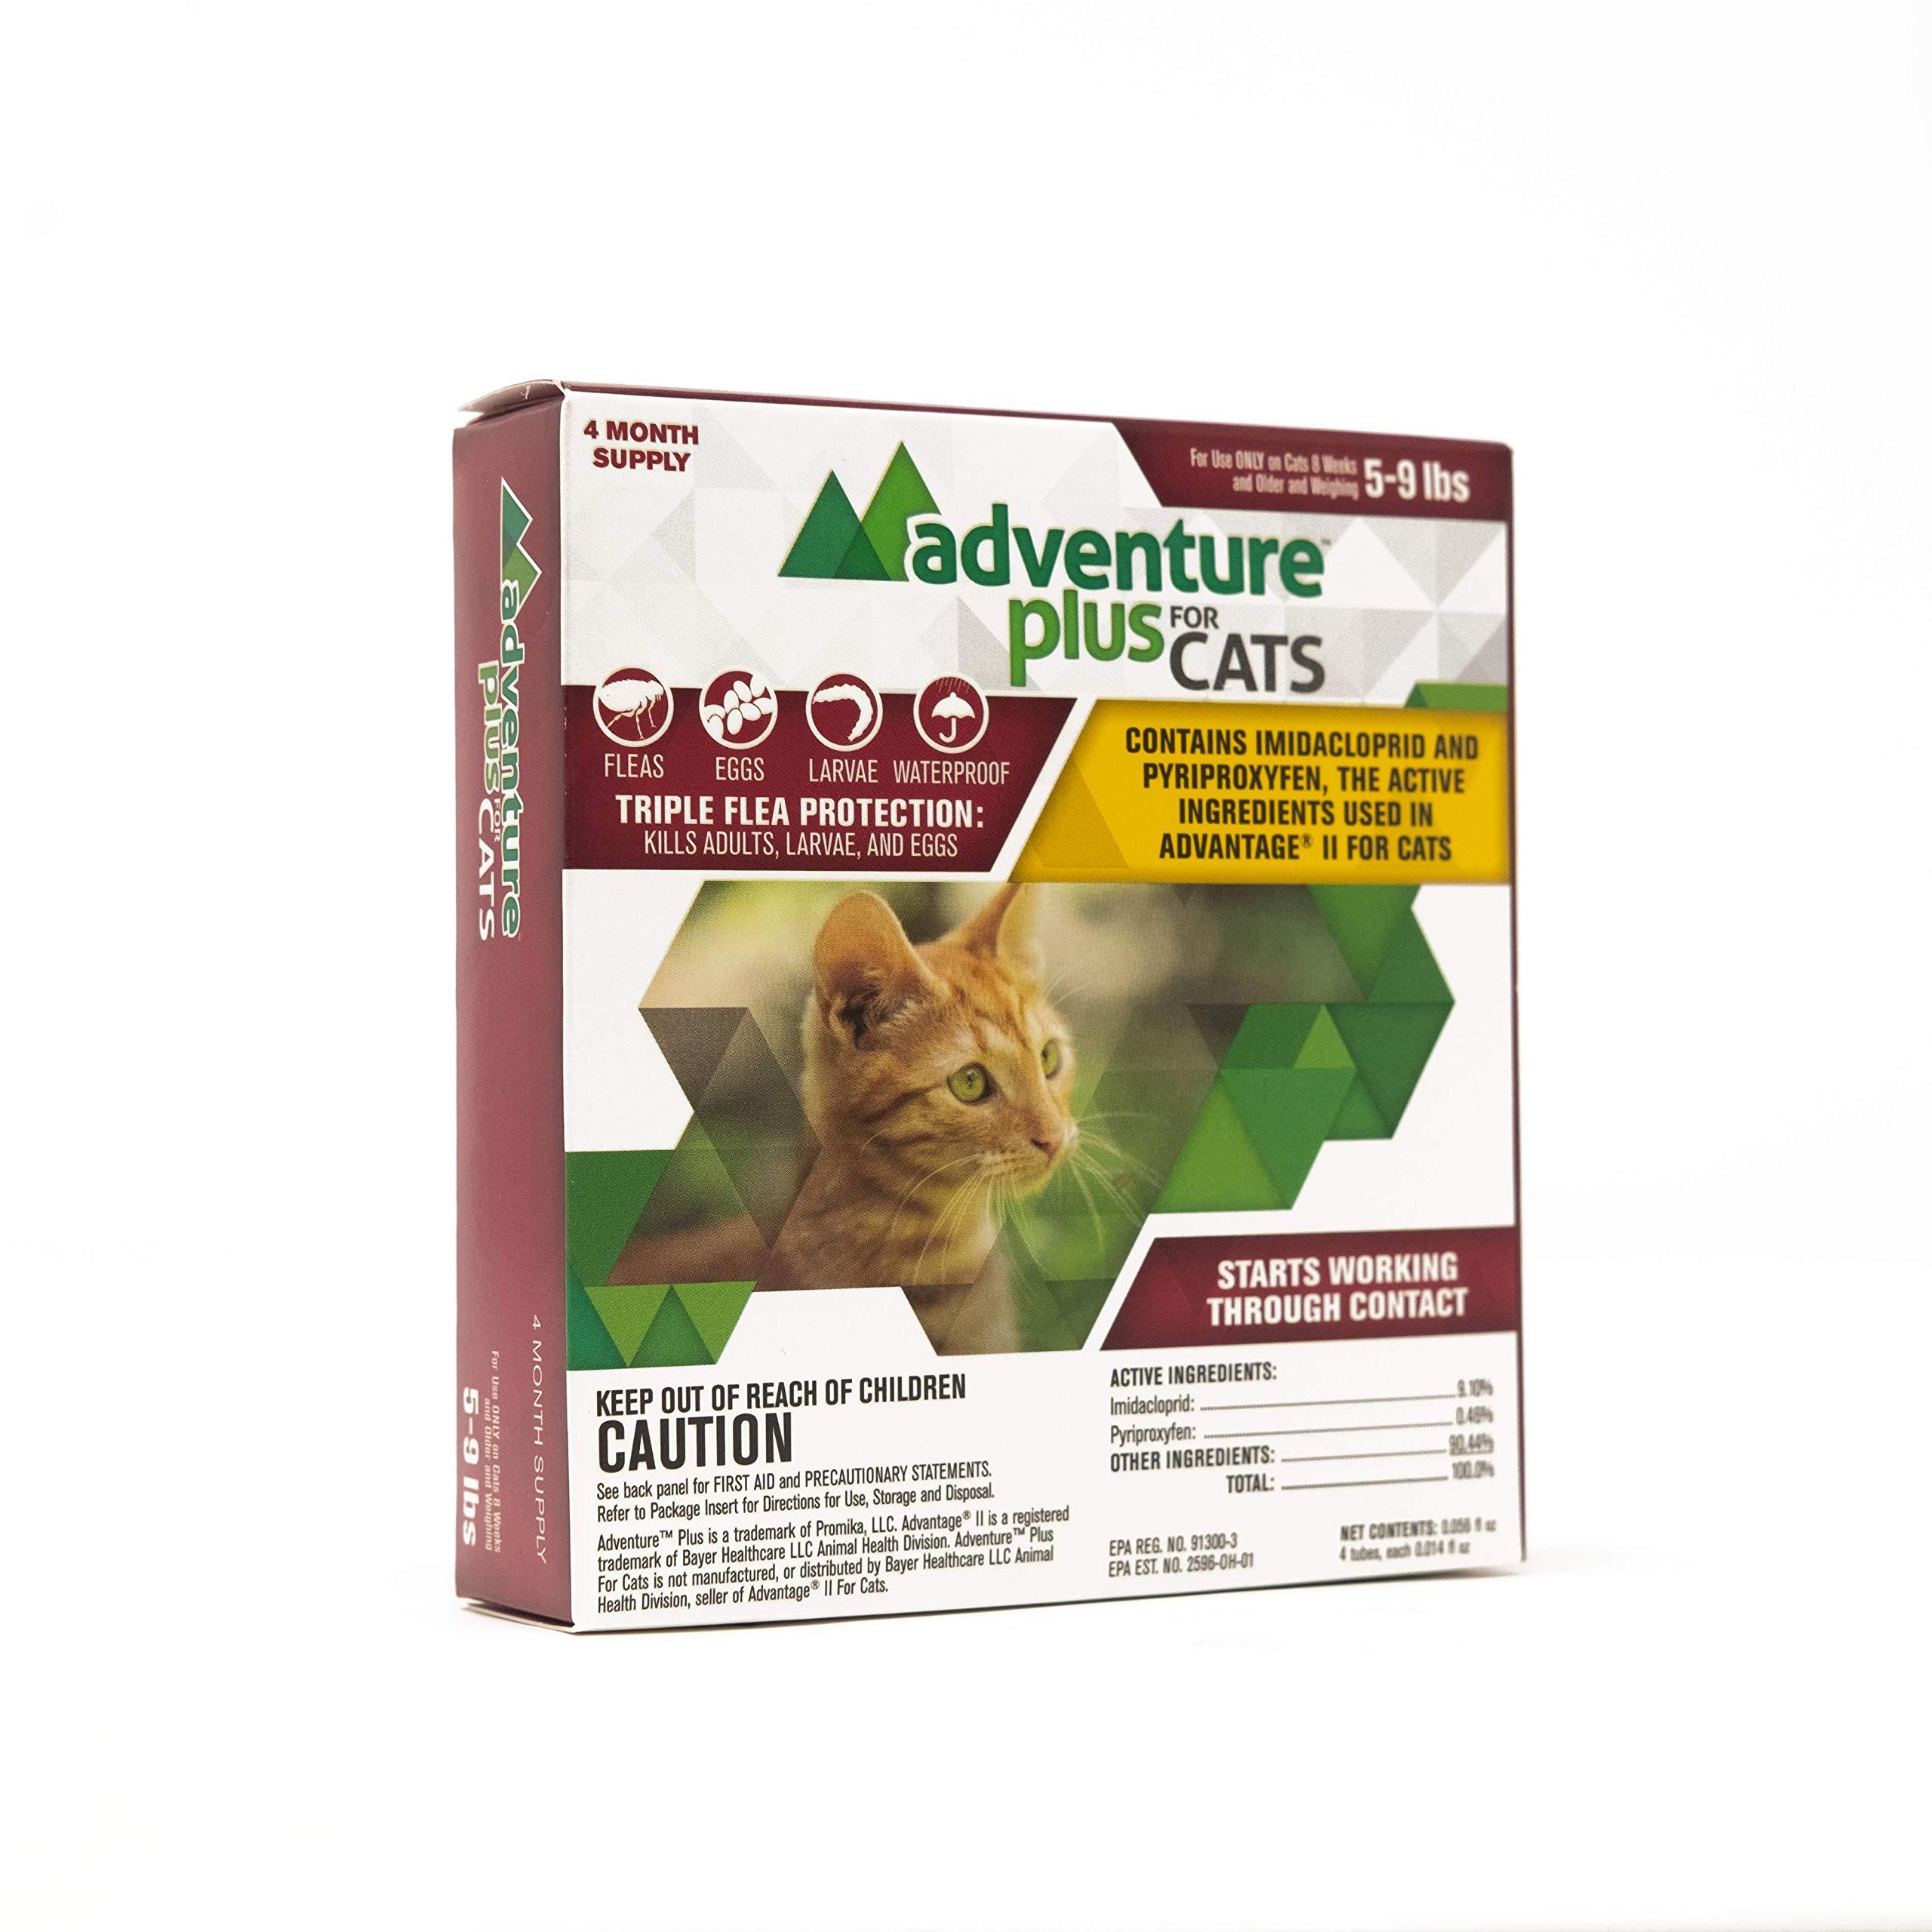 Adventure Plus Triple Flea Protection for Cats, 5-9 lbs, 8 Months, 8 Doses by ADVENTURE PLUS FOR CATS